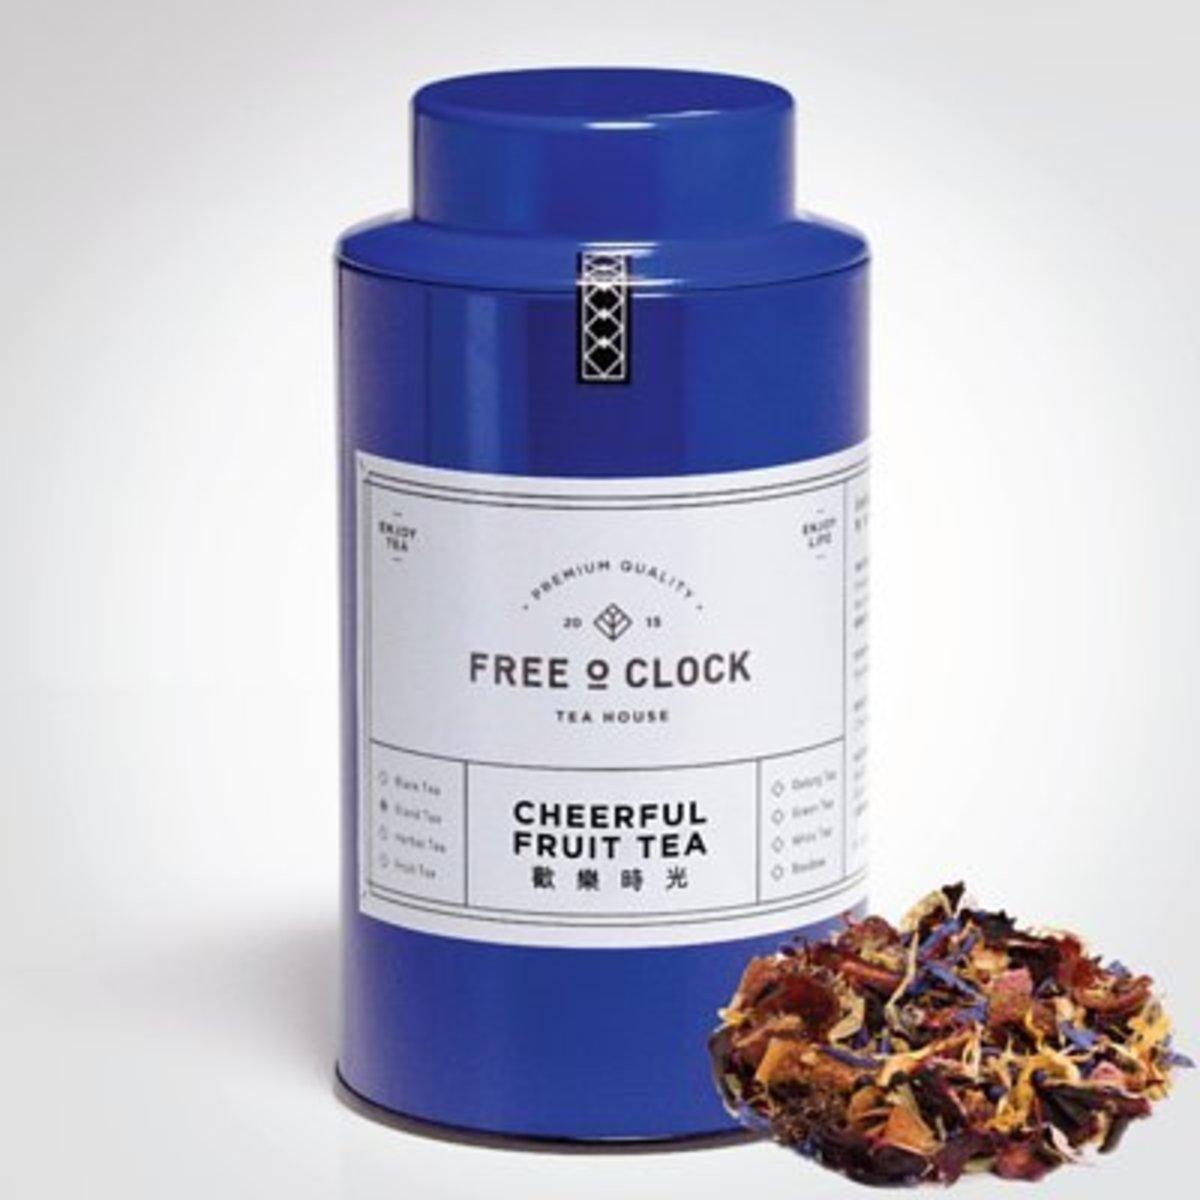 Cheerful Fruit Tea - 100g - blue can